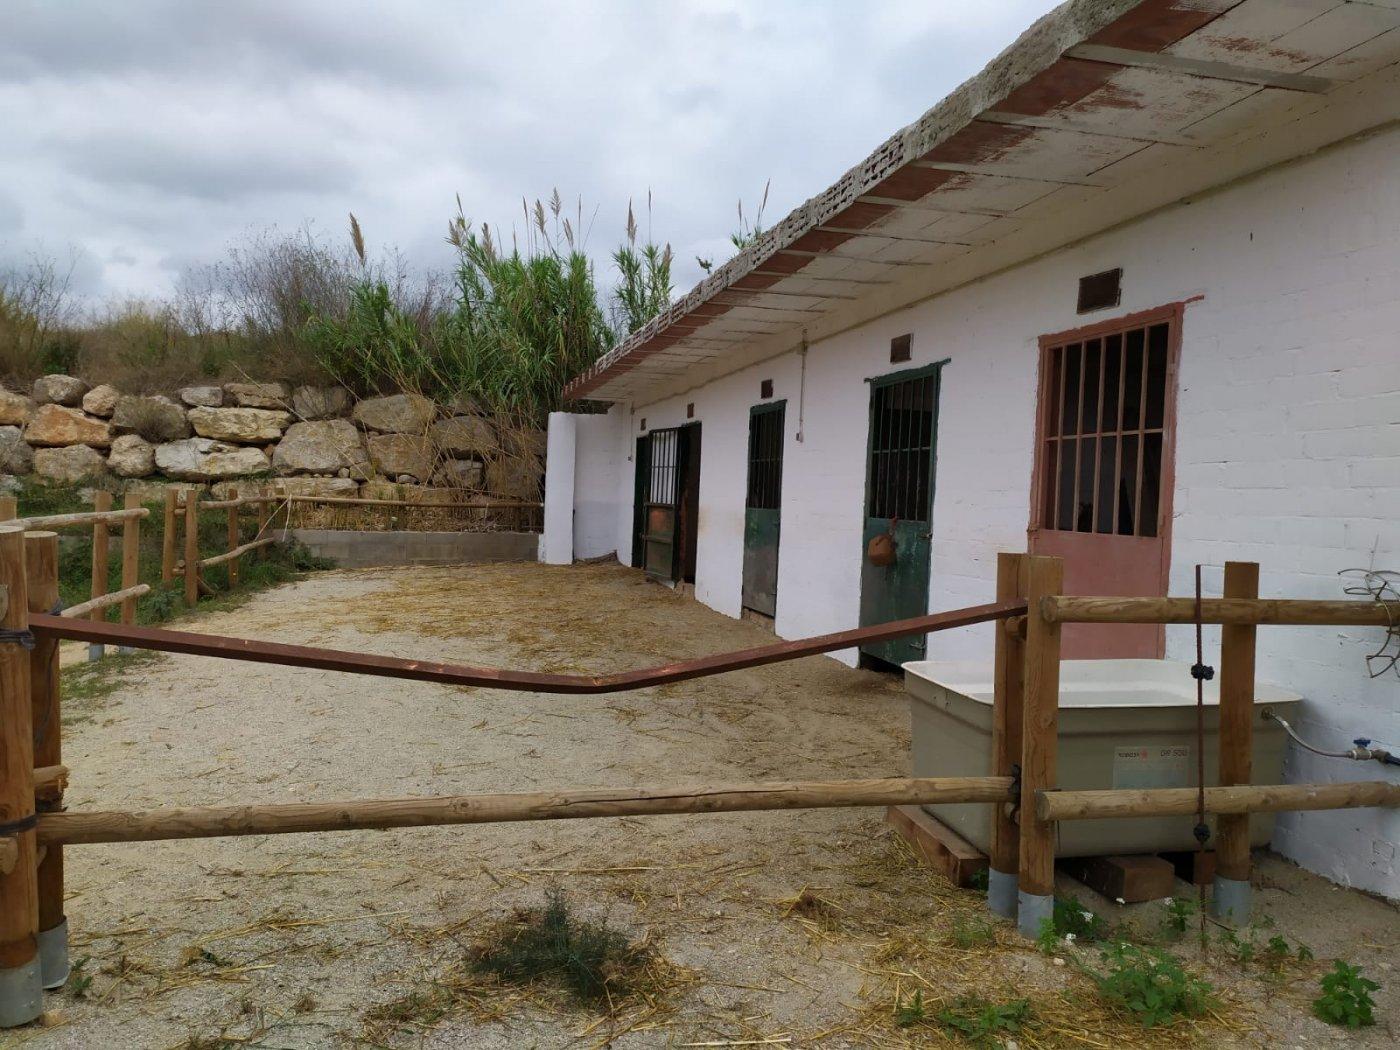 Terrenos rurales - a00535